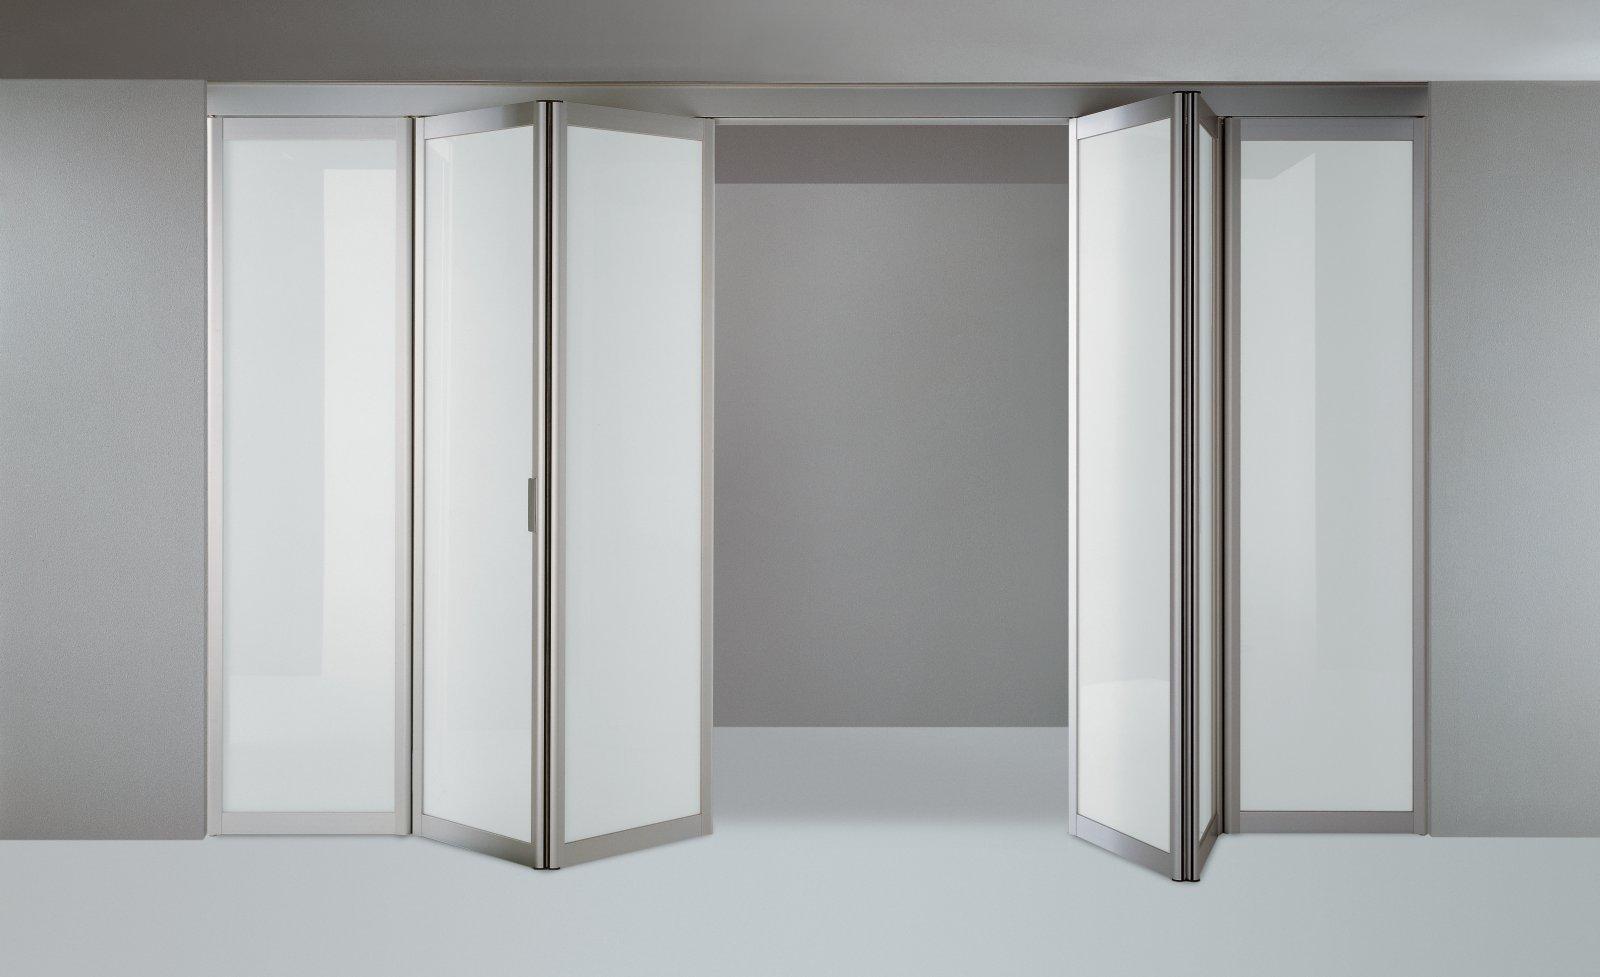 Cristaleria bcn cristaleros y carpinteria de aluminio - Puerta de cristal abatible ...